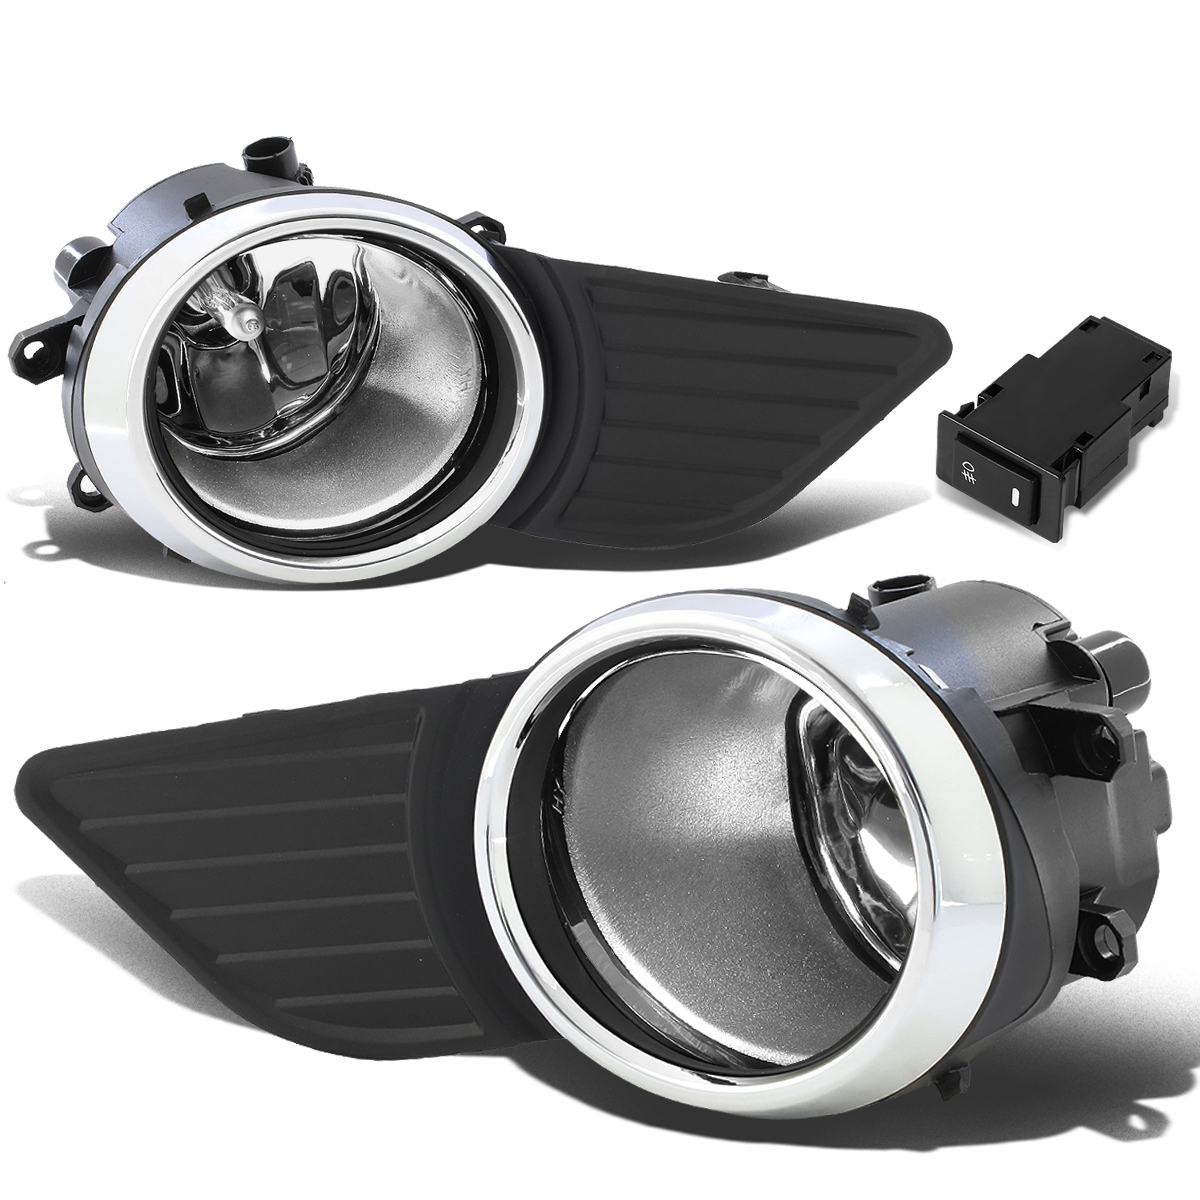 For 11-17 Toyota Sienna Pair Driving Bumper Fog Light/Lamp+Bezel+Switch Chrome Ring Clear Lens 12 13 14 15 16